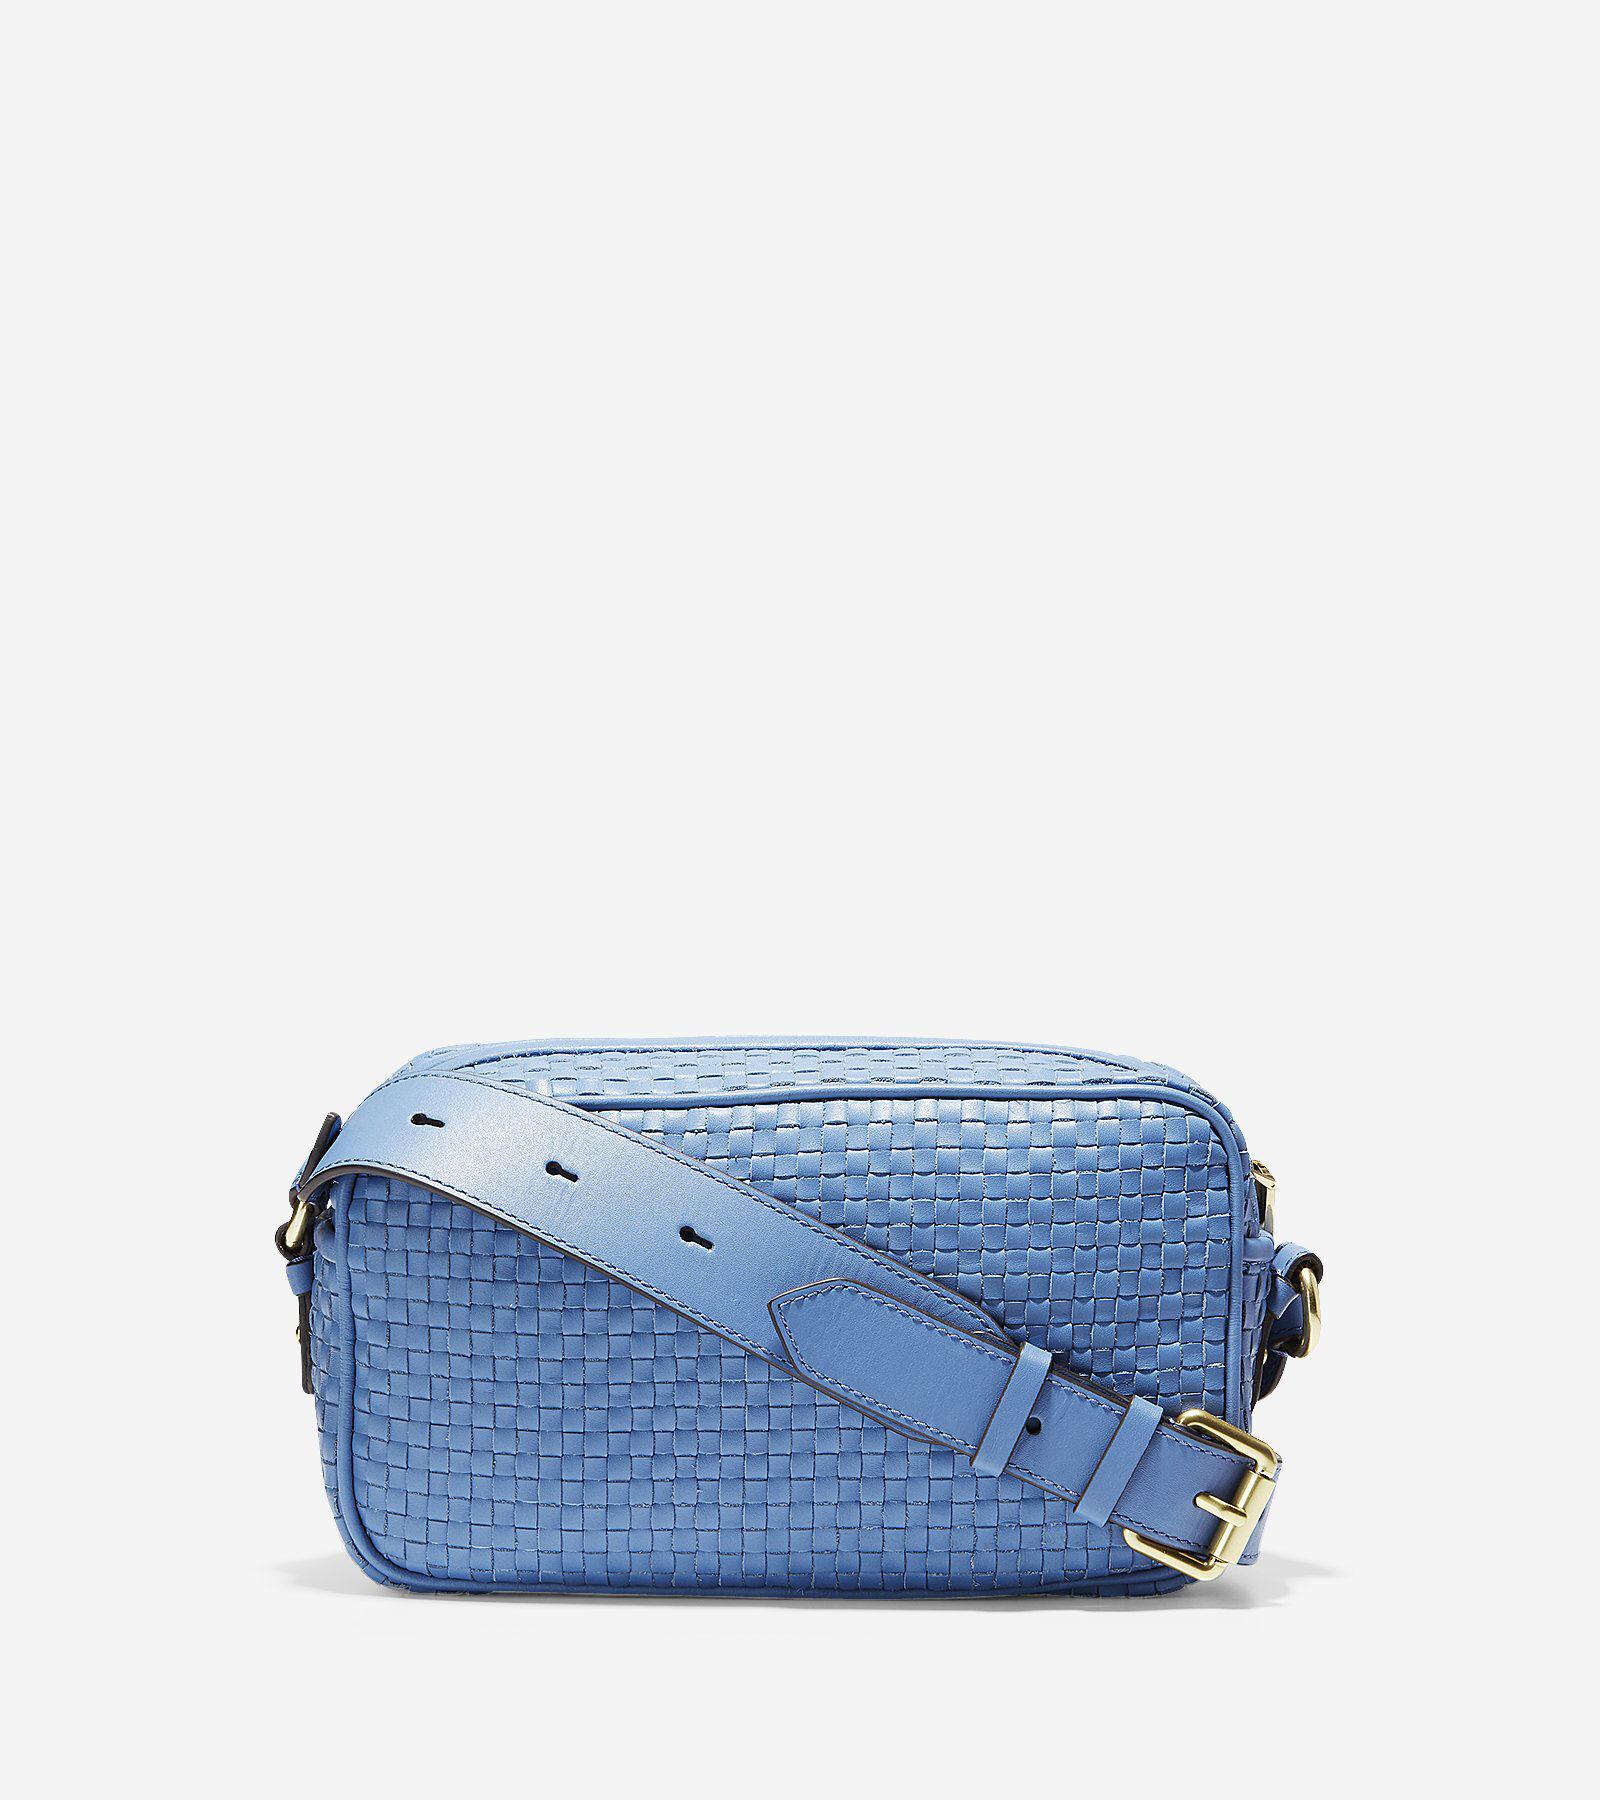 Blue Shoulder Bag - OS / BLUE I Saw It First UG9TPp6oe